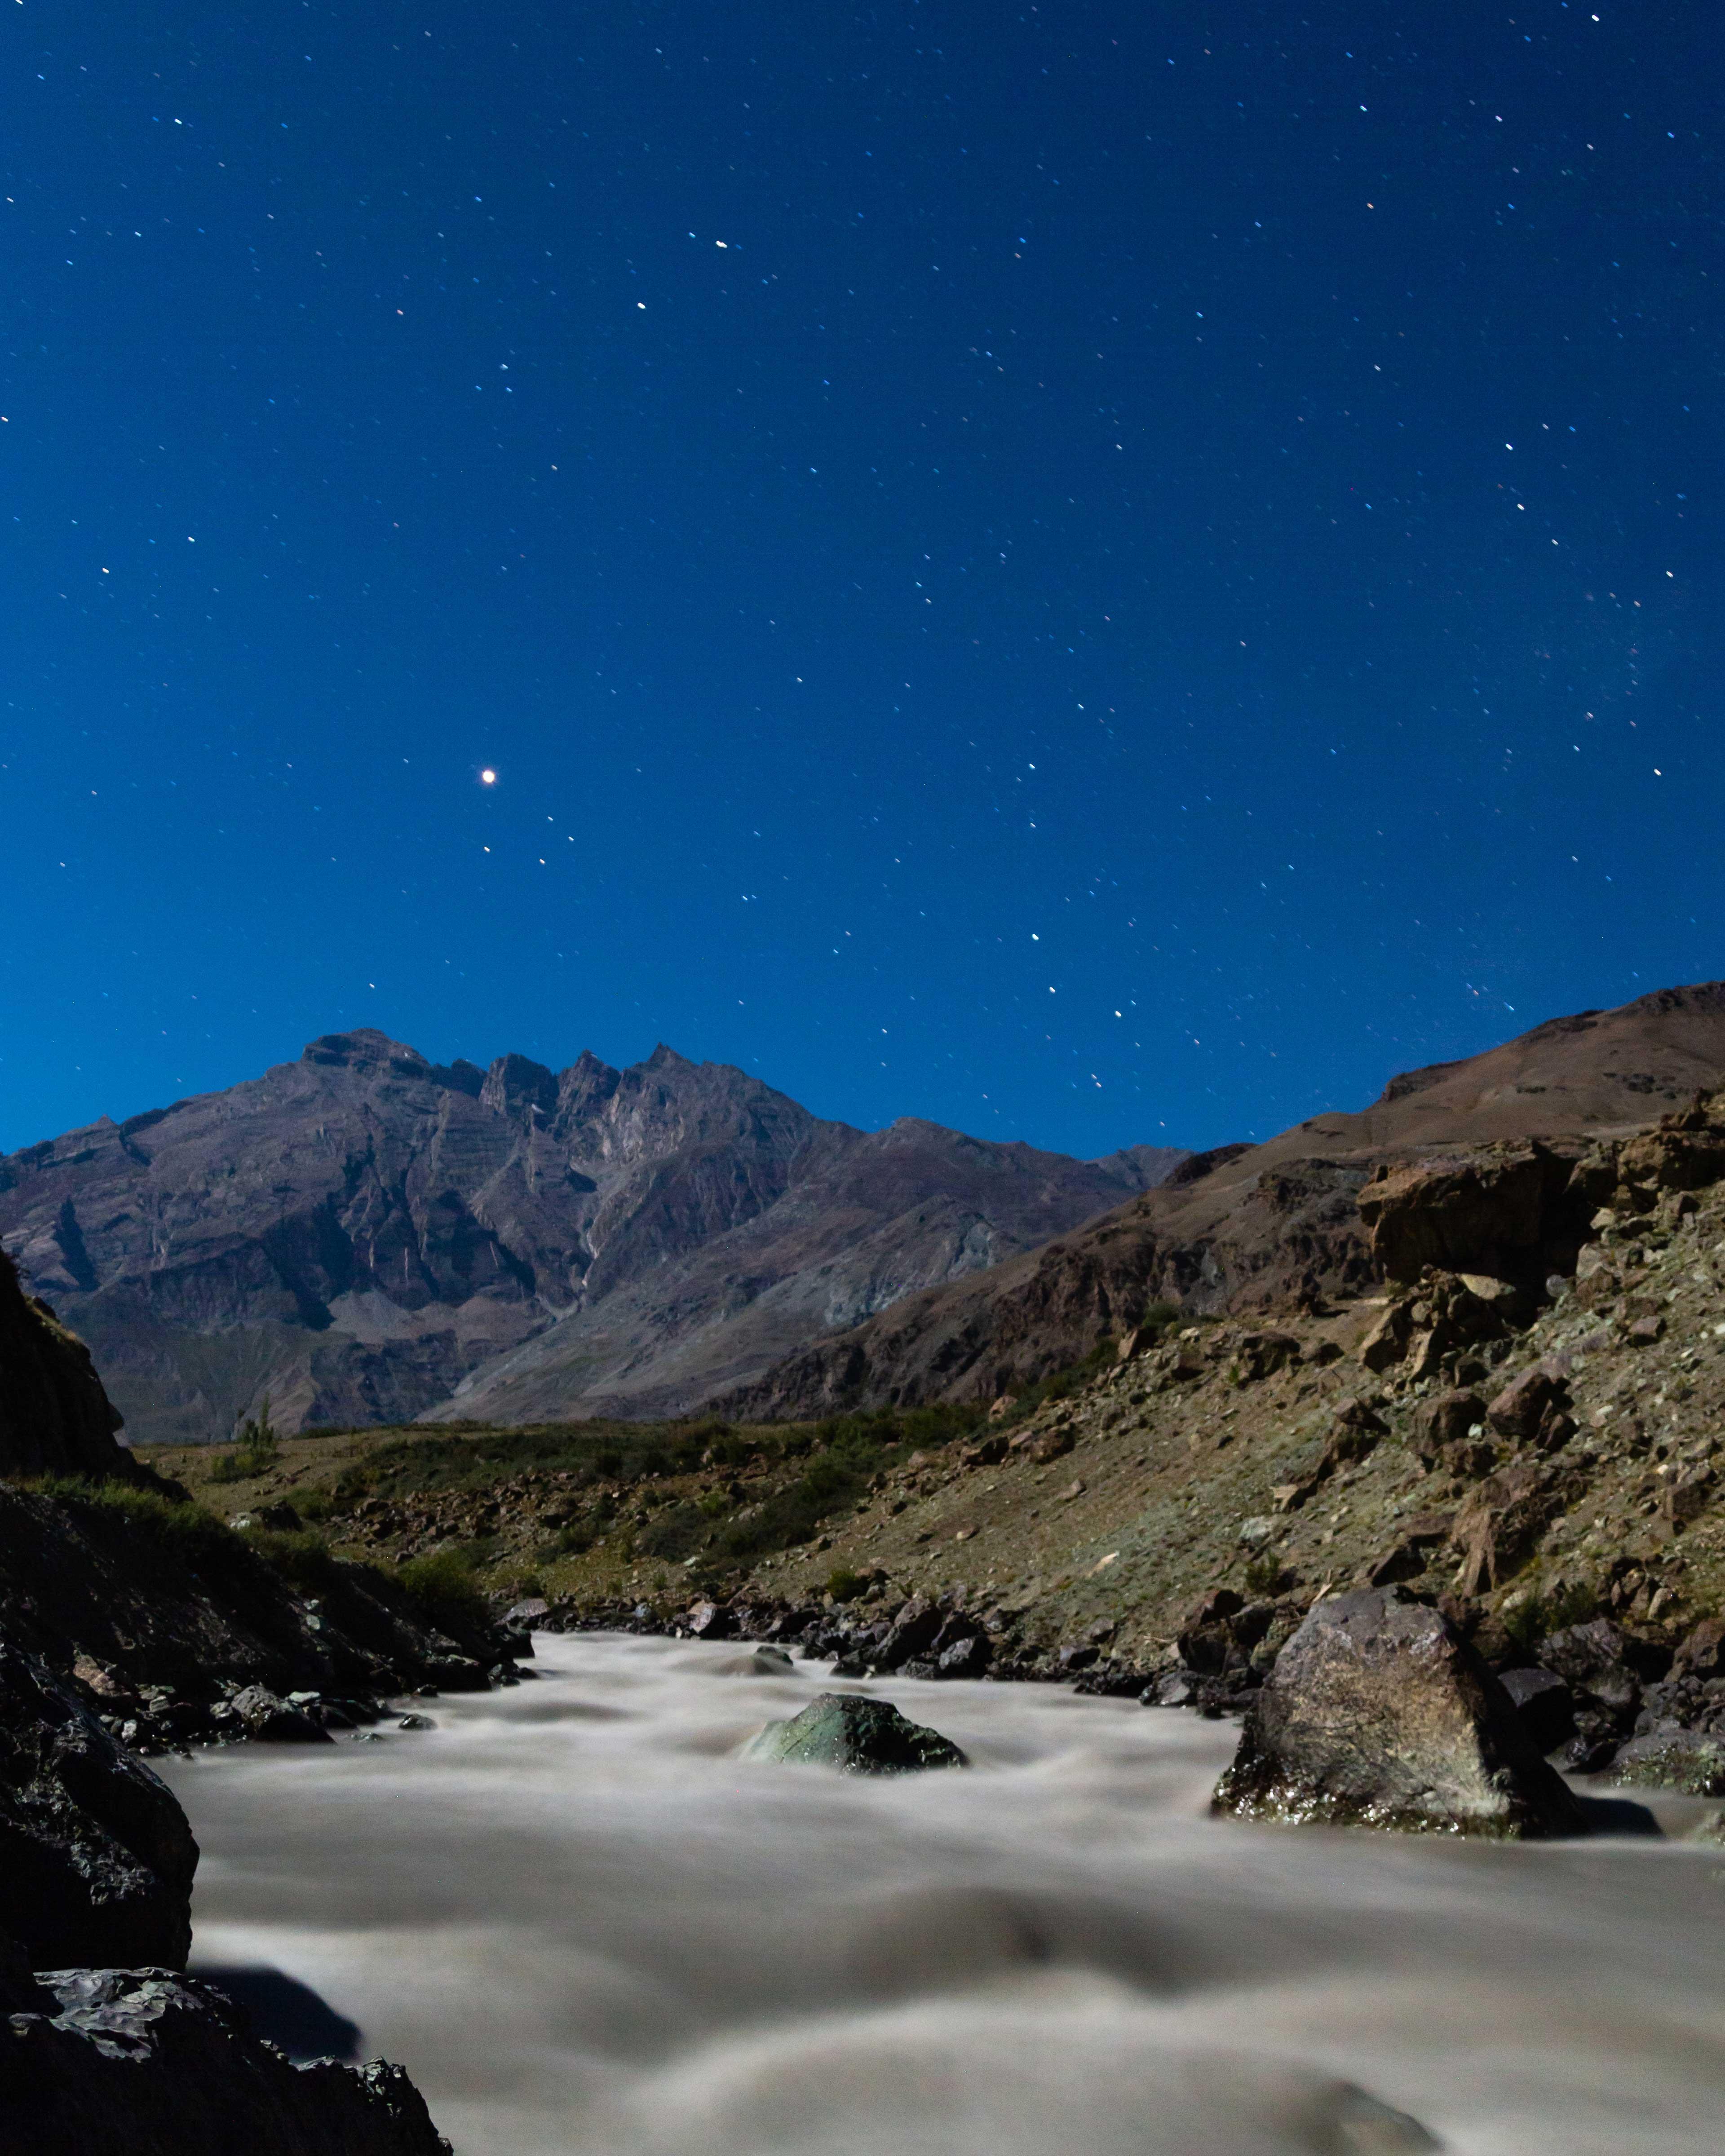 River suru at night